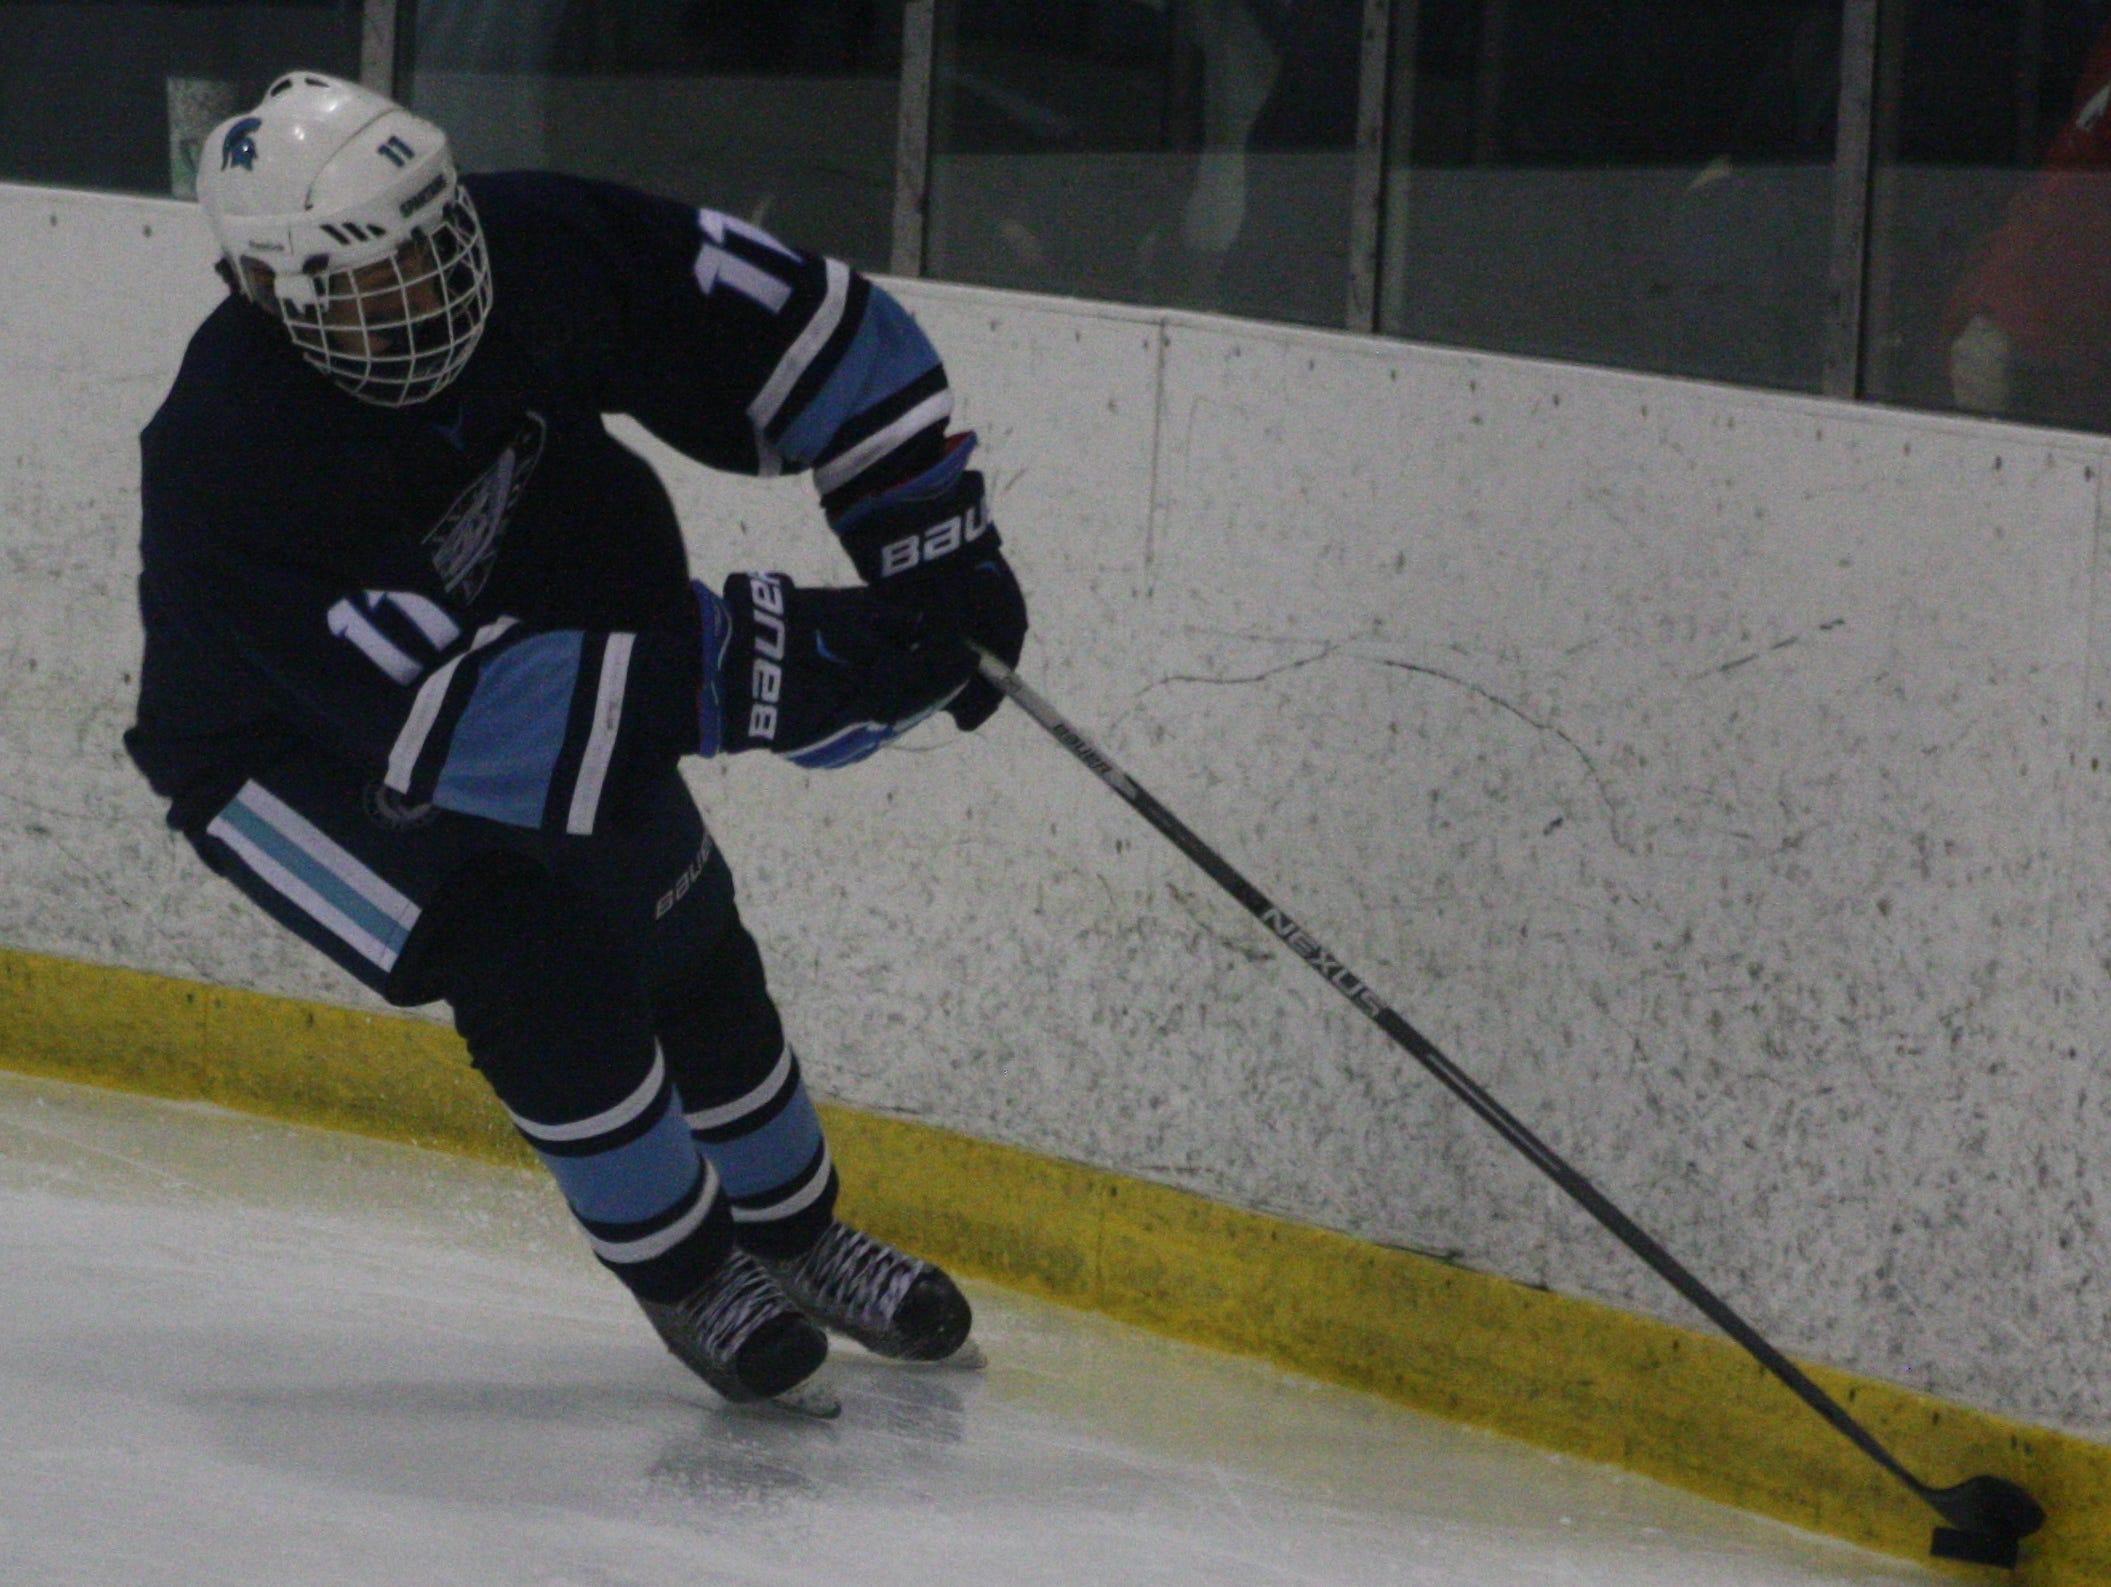 Stevenson's Sam Judd steers the puck around the boards Wednesday night.